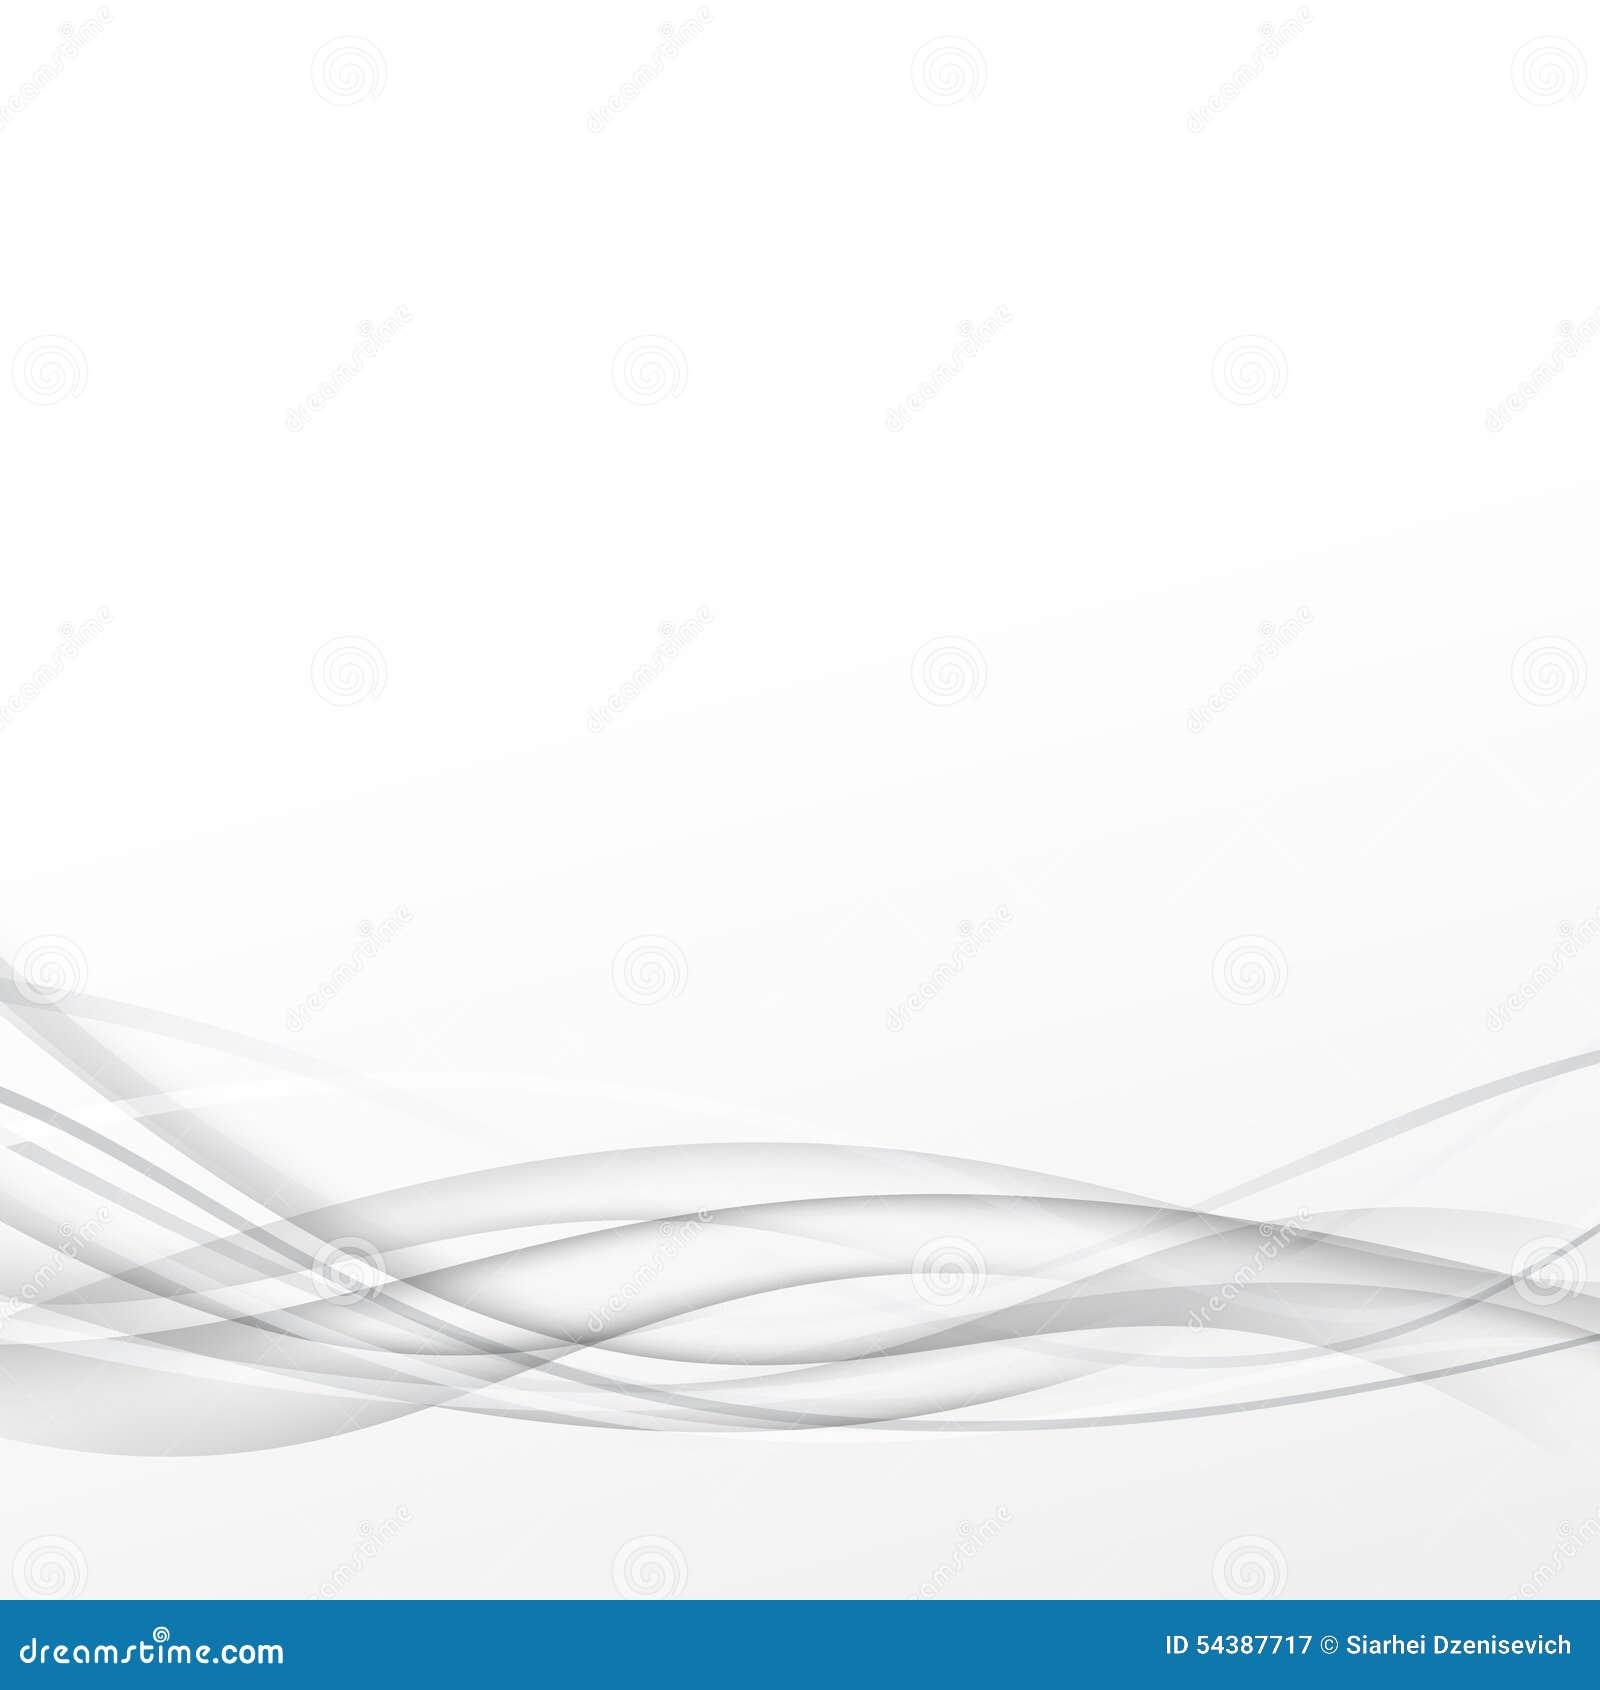 Line Art Design Background : Grey abstract smooth line transparent swoosh background